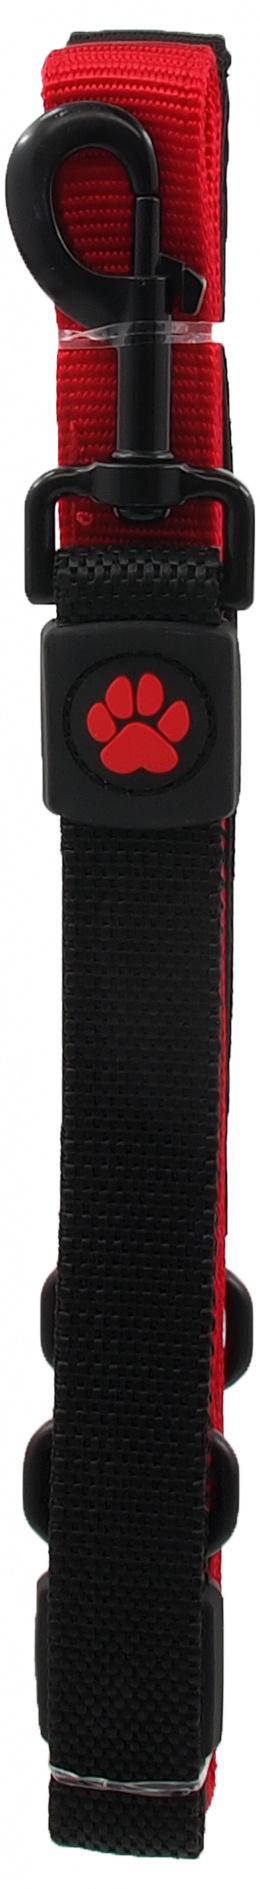 Vodítko Active Dog Bungee Neoprene L červené 2,5x120cm